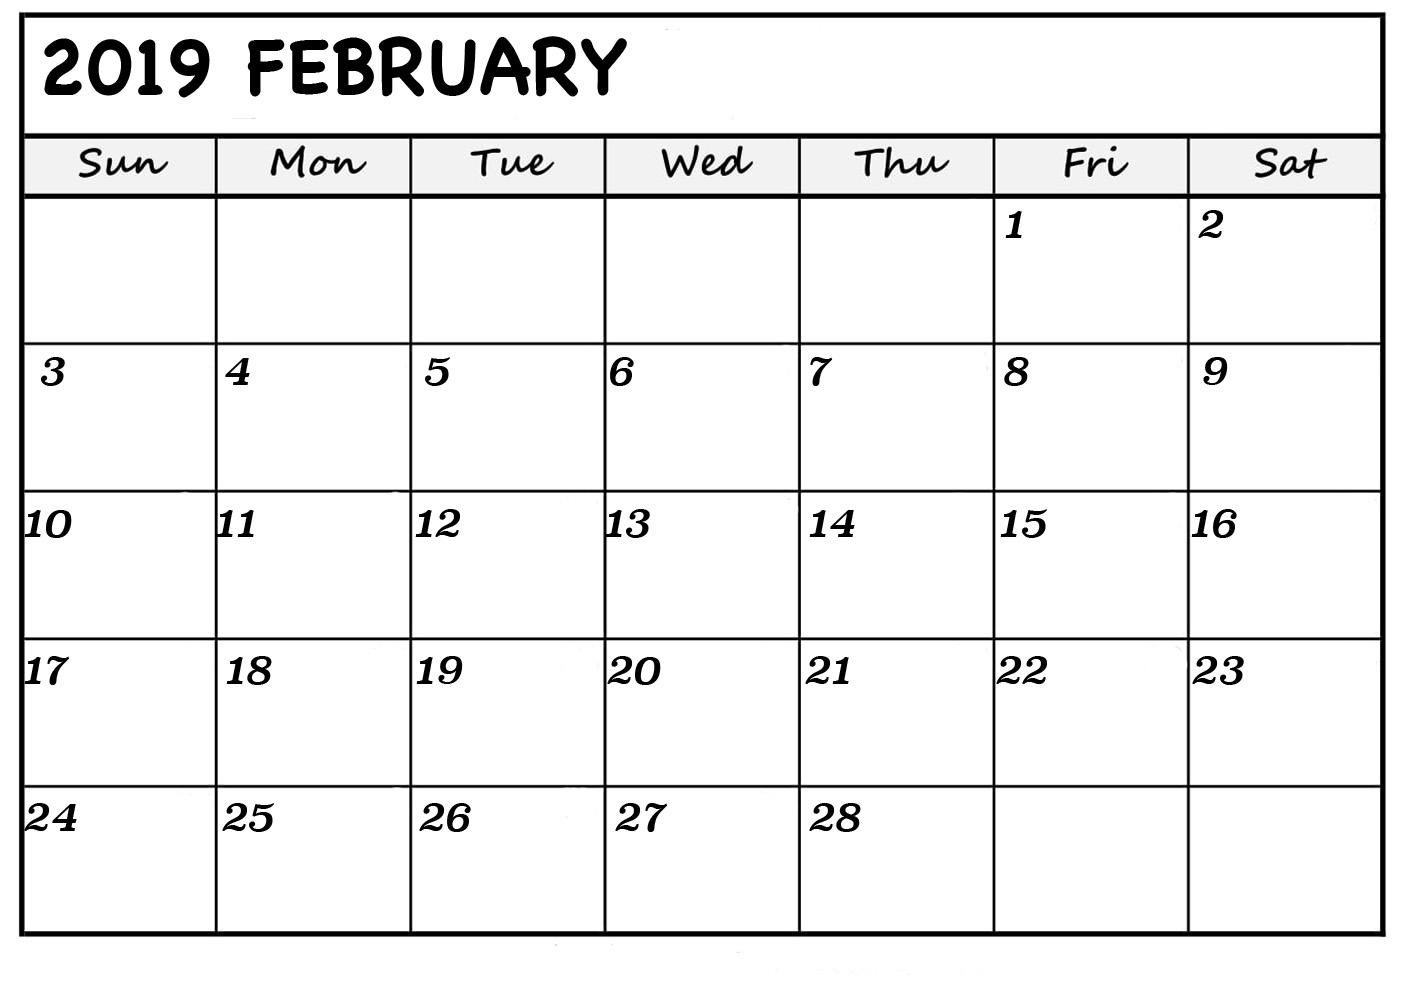 February 2019 Calendar Wincalendar February 2019 Calendar Printable   Fresh Calendars